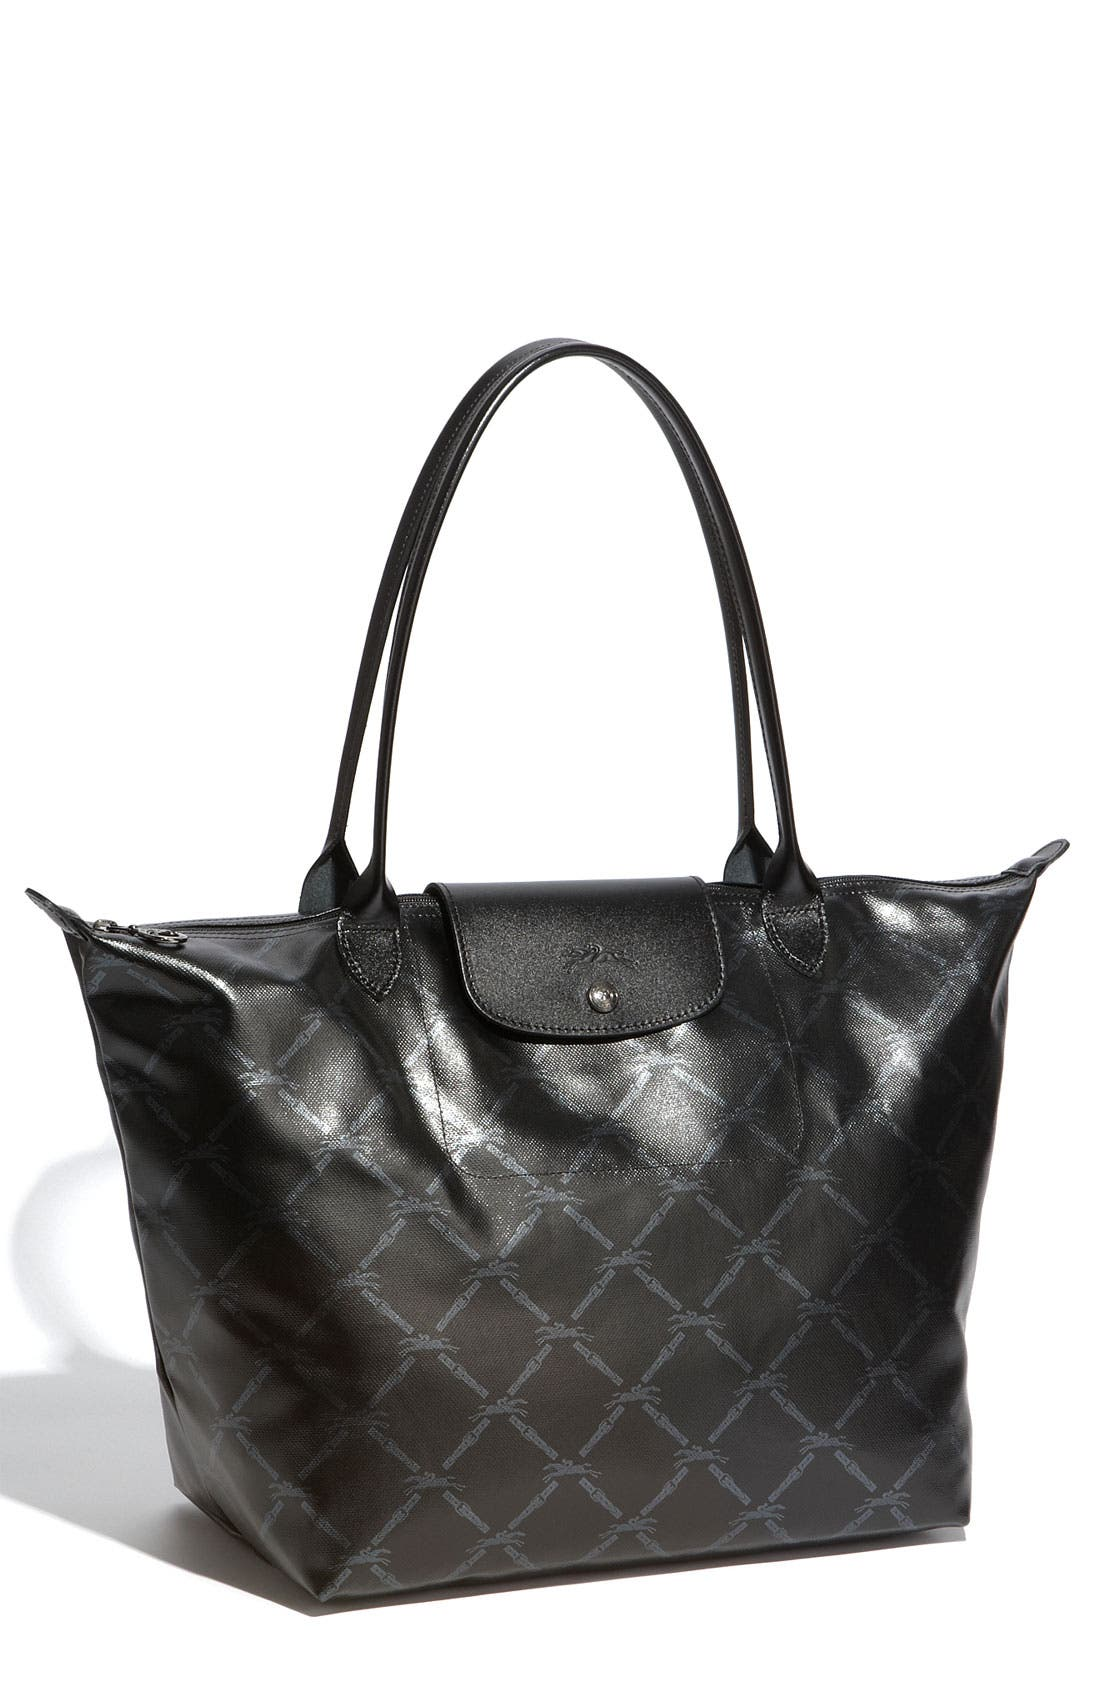 Alternate Image 1 Selected - Longchamp 'LM Metal' Shoulder Tote